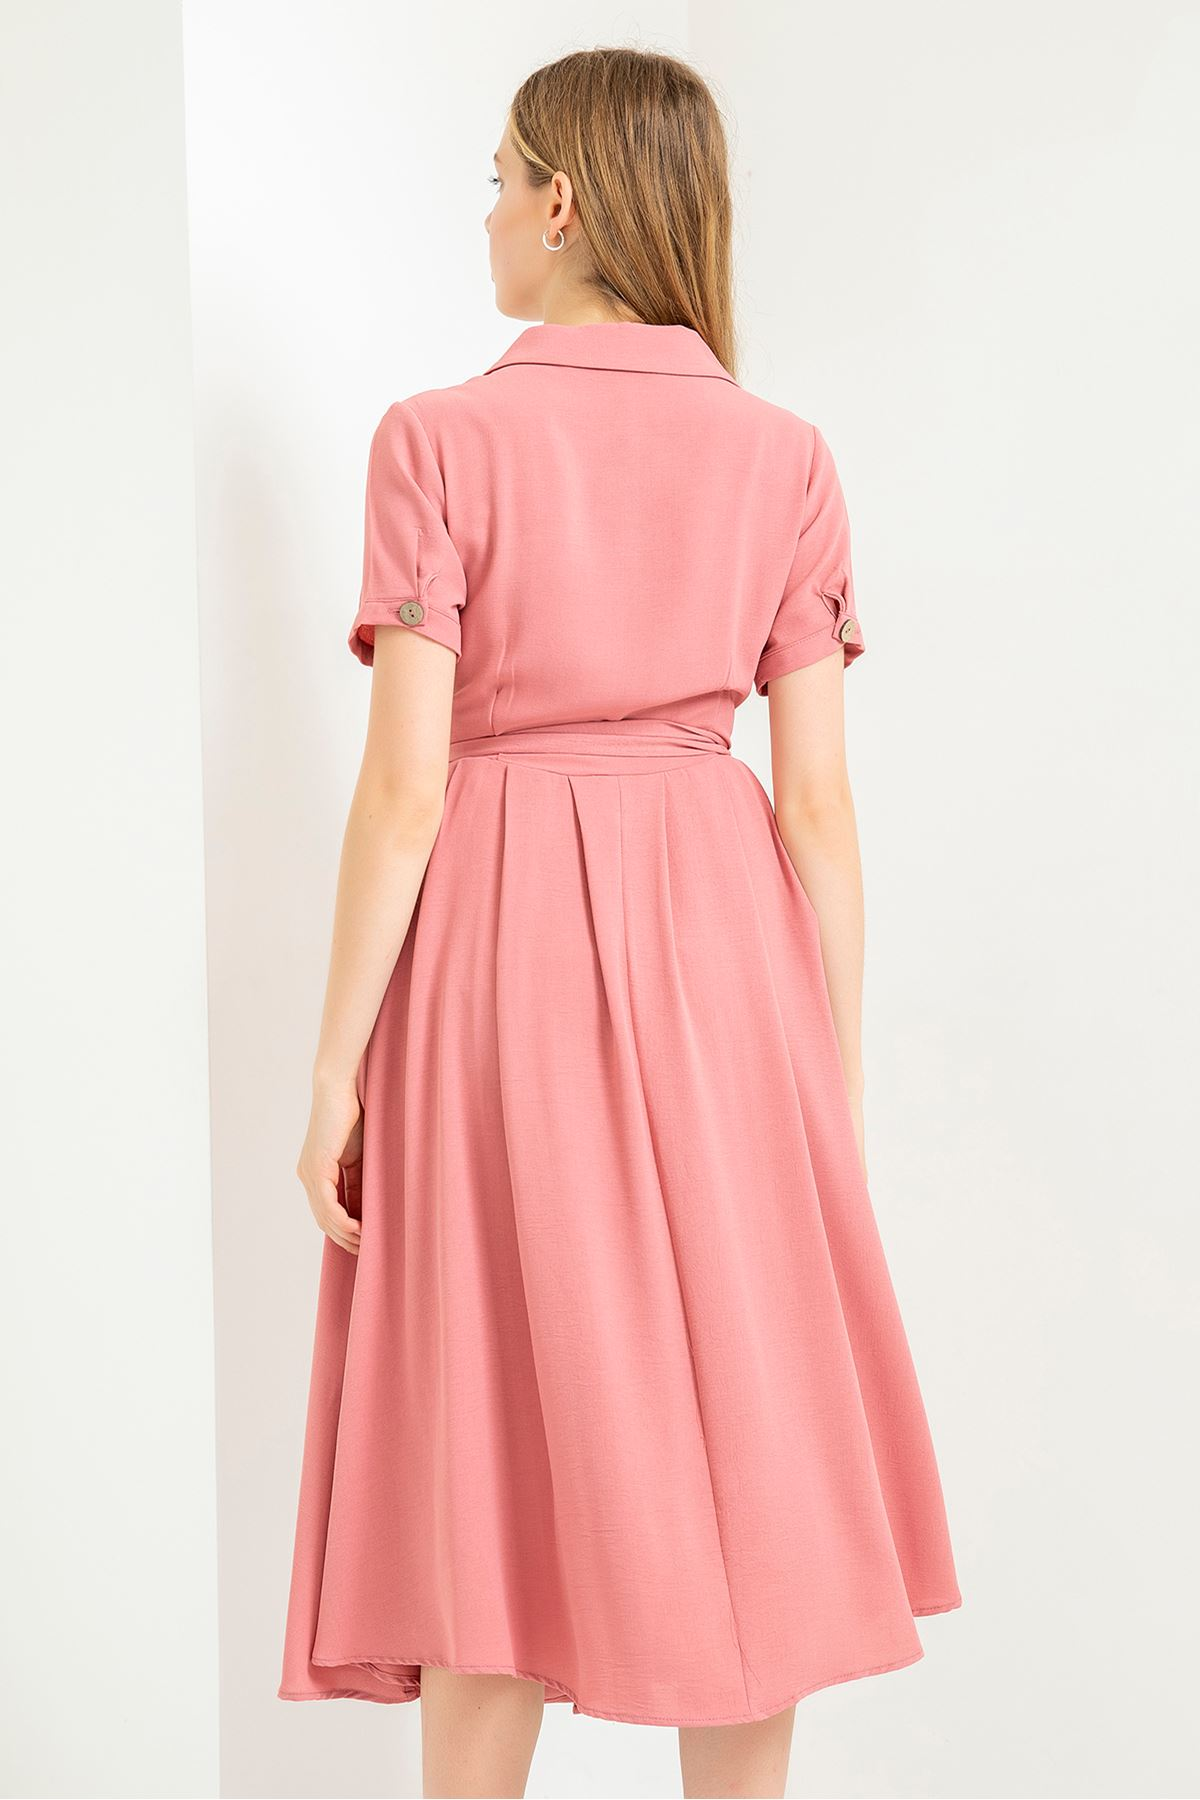 Cep Detay Elbise-Gül Kurusu